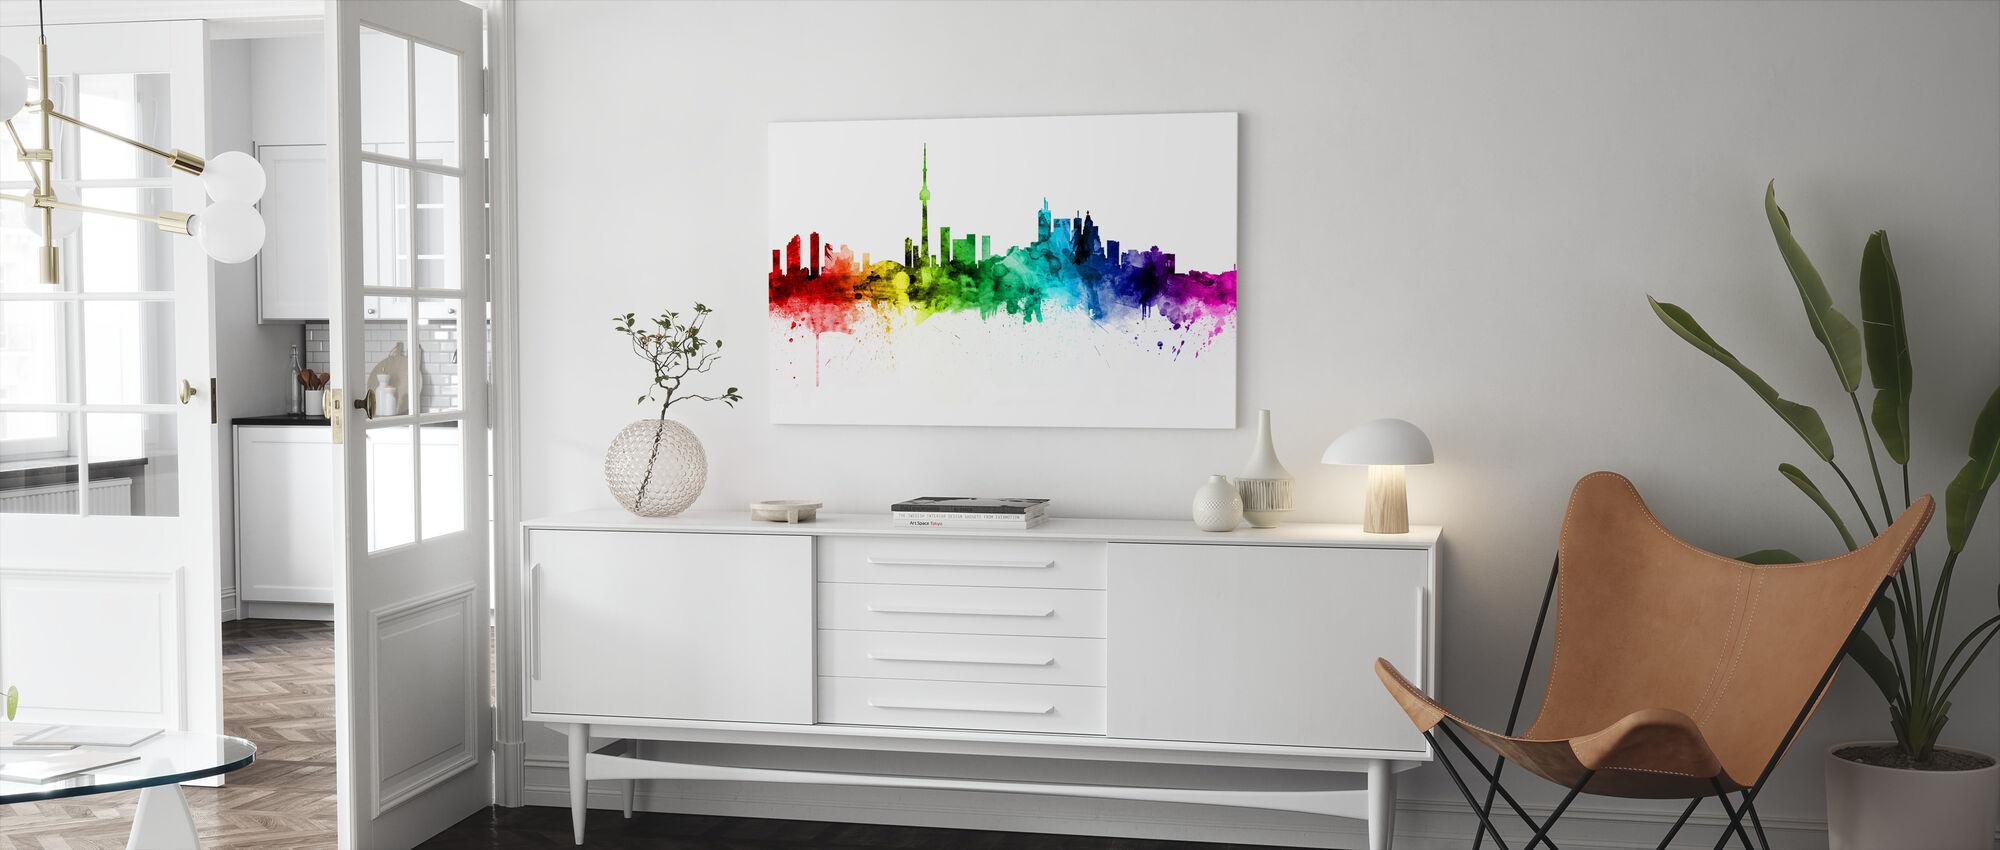 Toronto Skyline Rainbow - Canvas print - Living Room